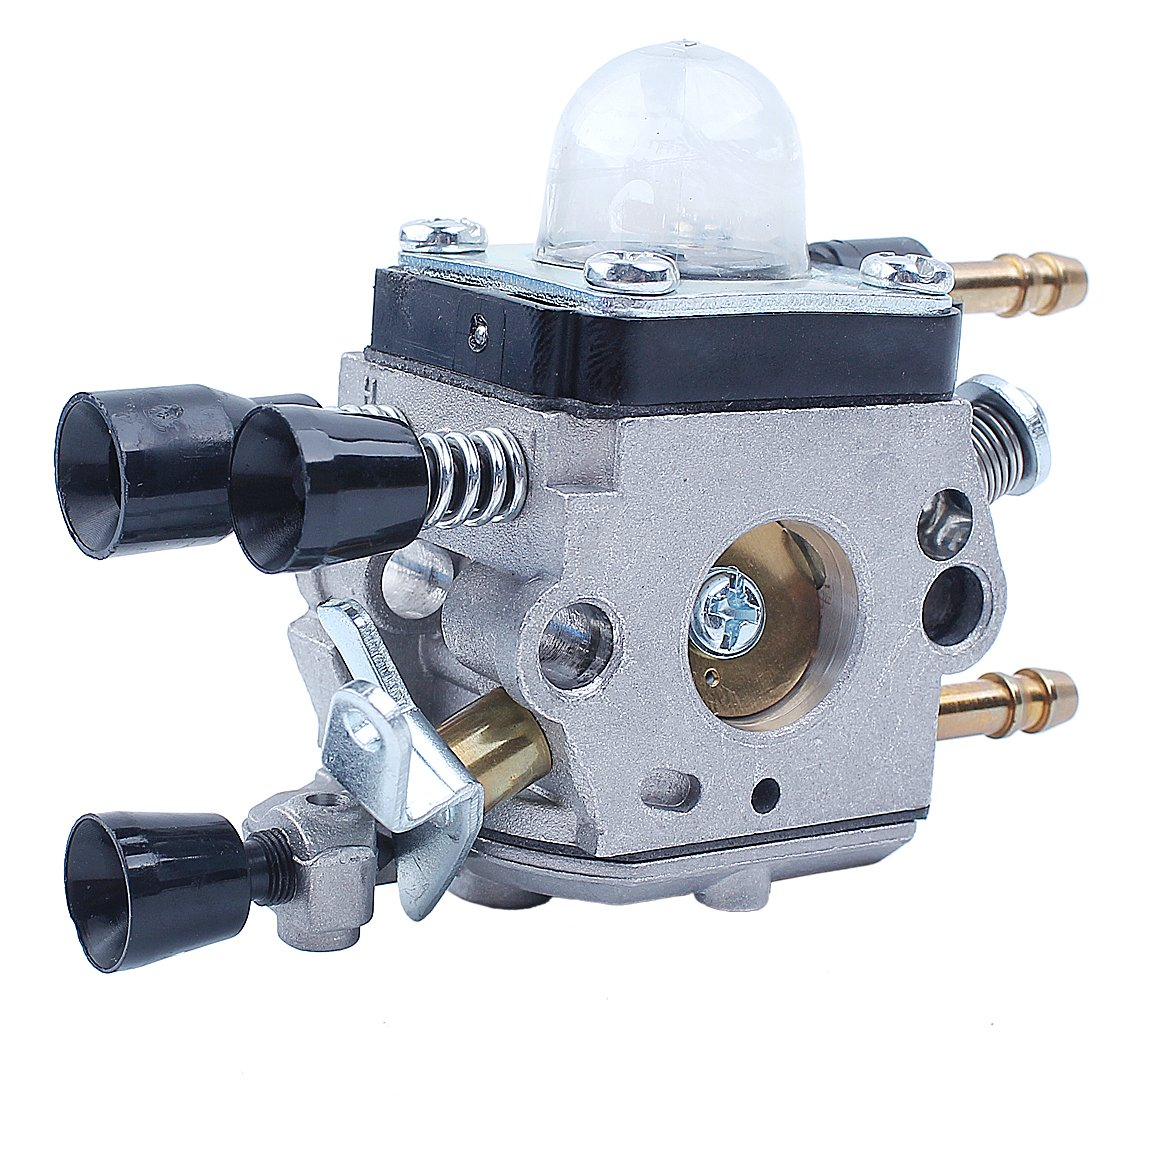 Haishine Kit de buj/ías del Filtro de Combustible de la Junta del carburador para Stihl BG45 BG46 BG55 BG65 BG85 SH55 SH85 soplador # 42291200606 ZAMA C1Q-S68G